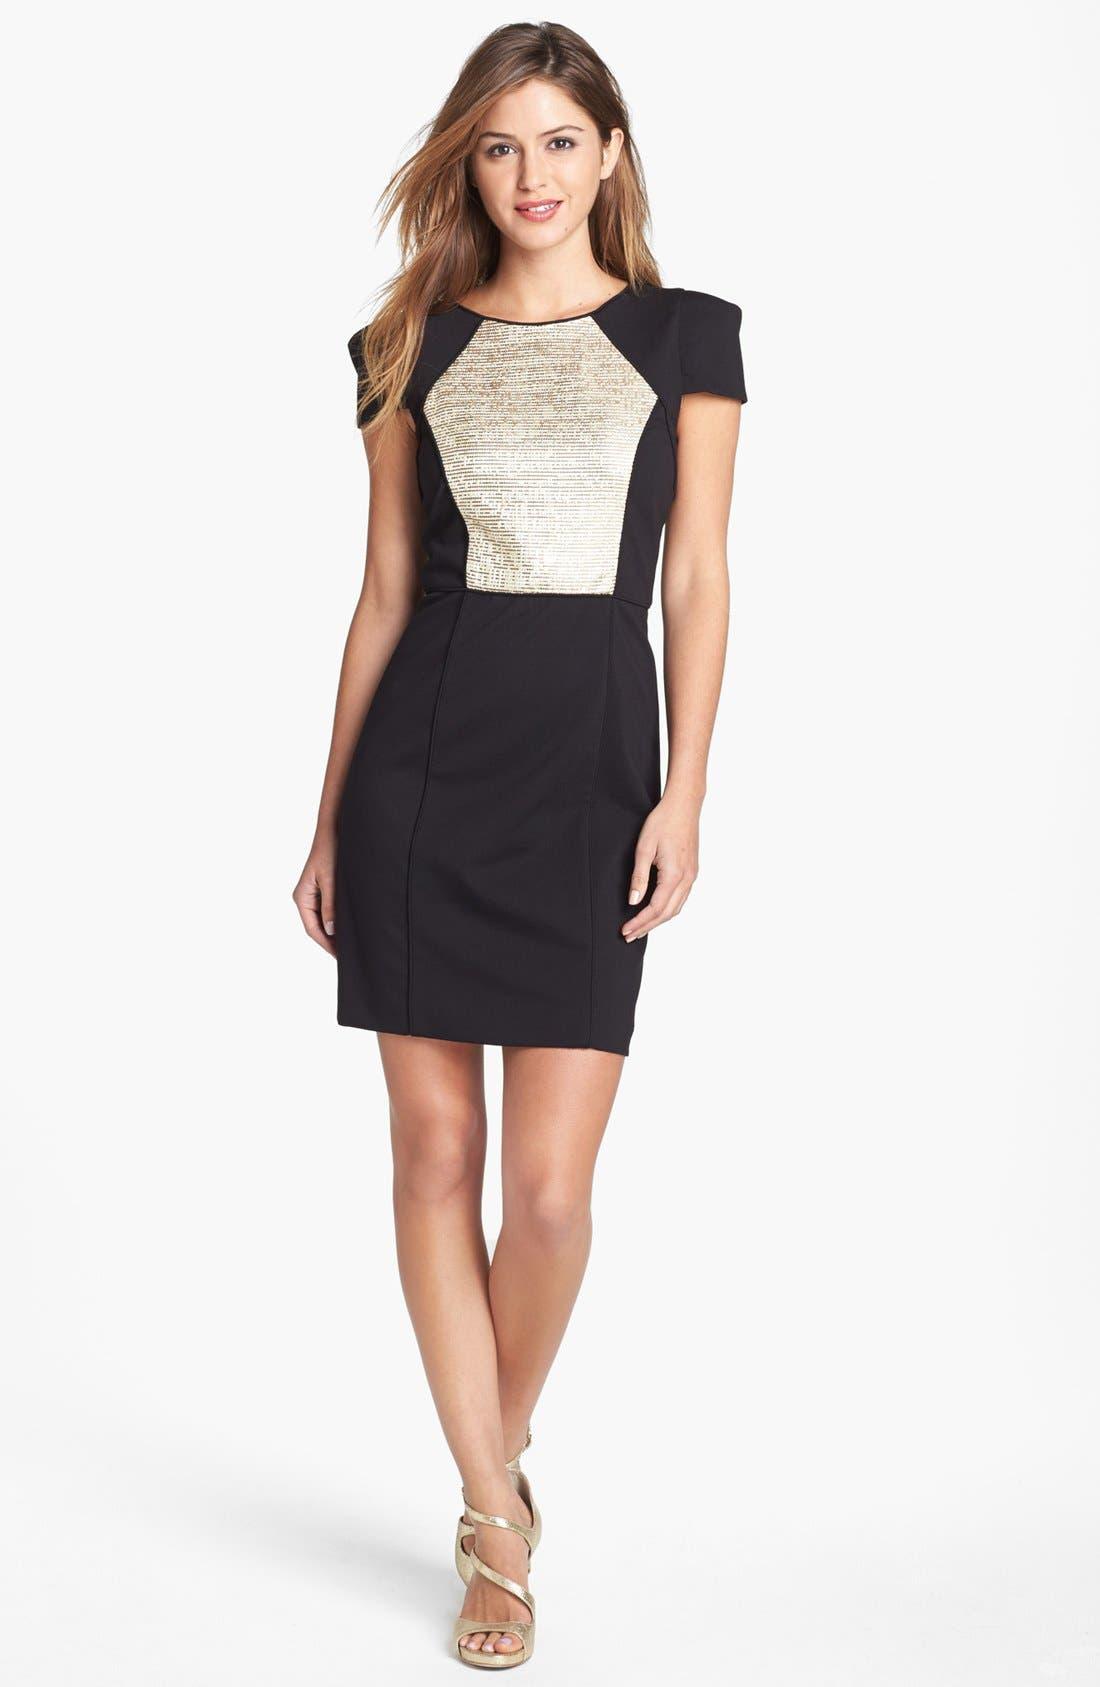 Alternate Image 1 Selected - 4.collective Metallic Panel Knit Sheath Dress